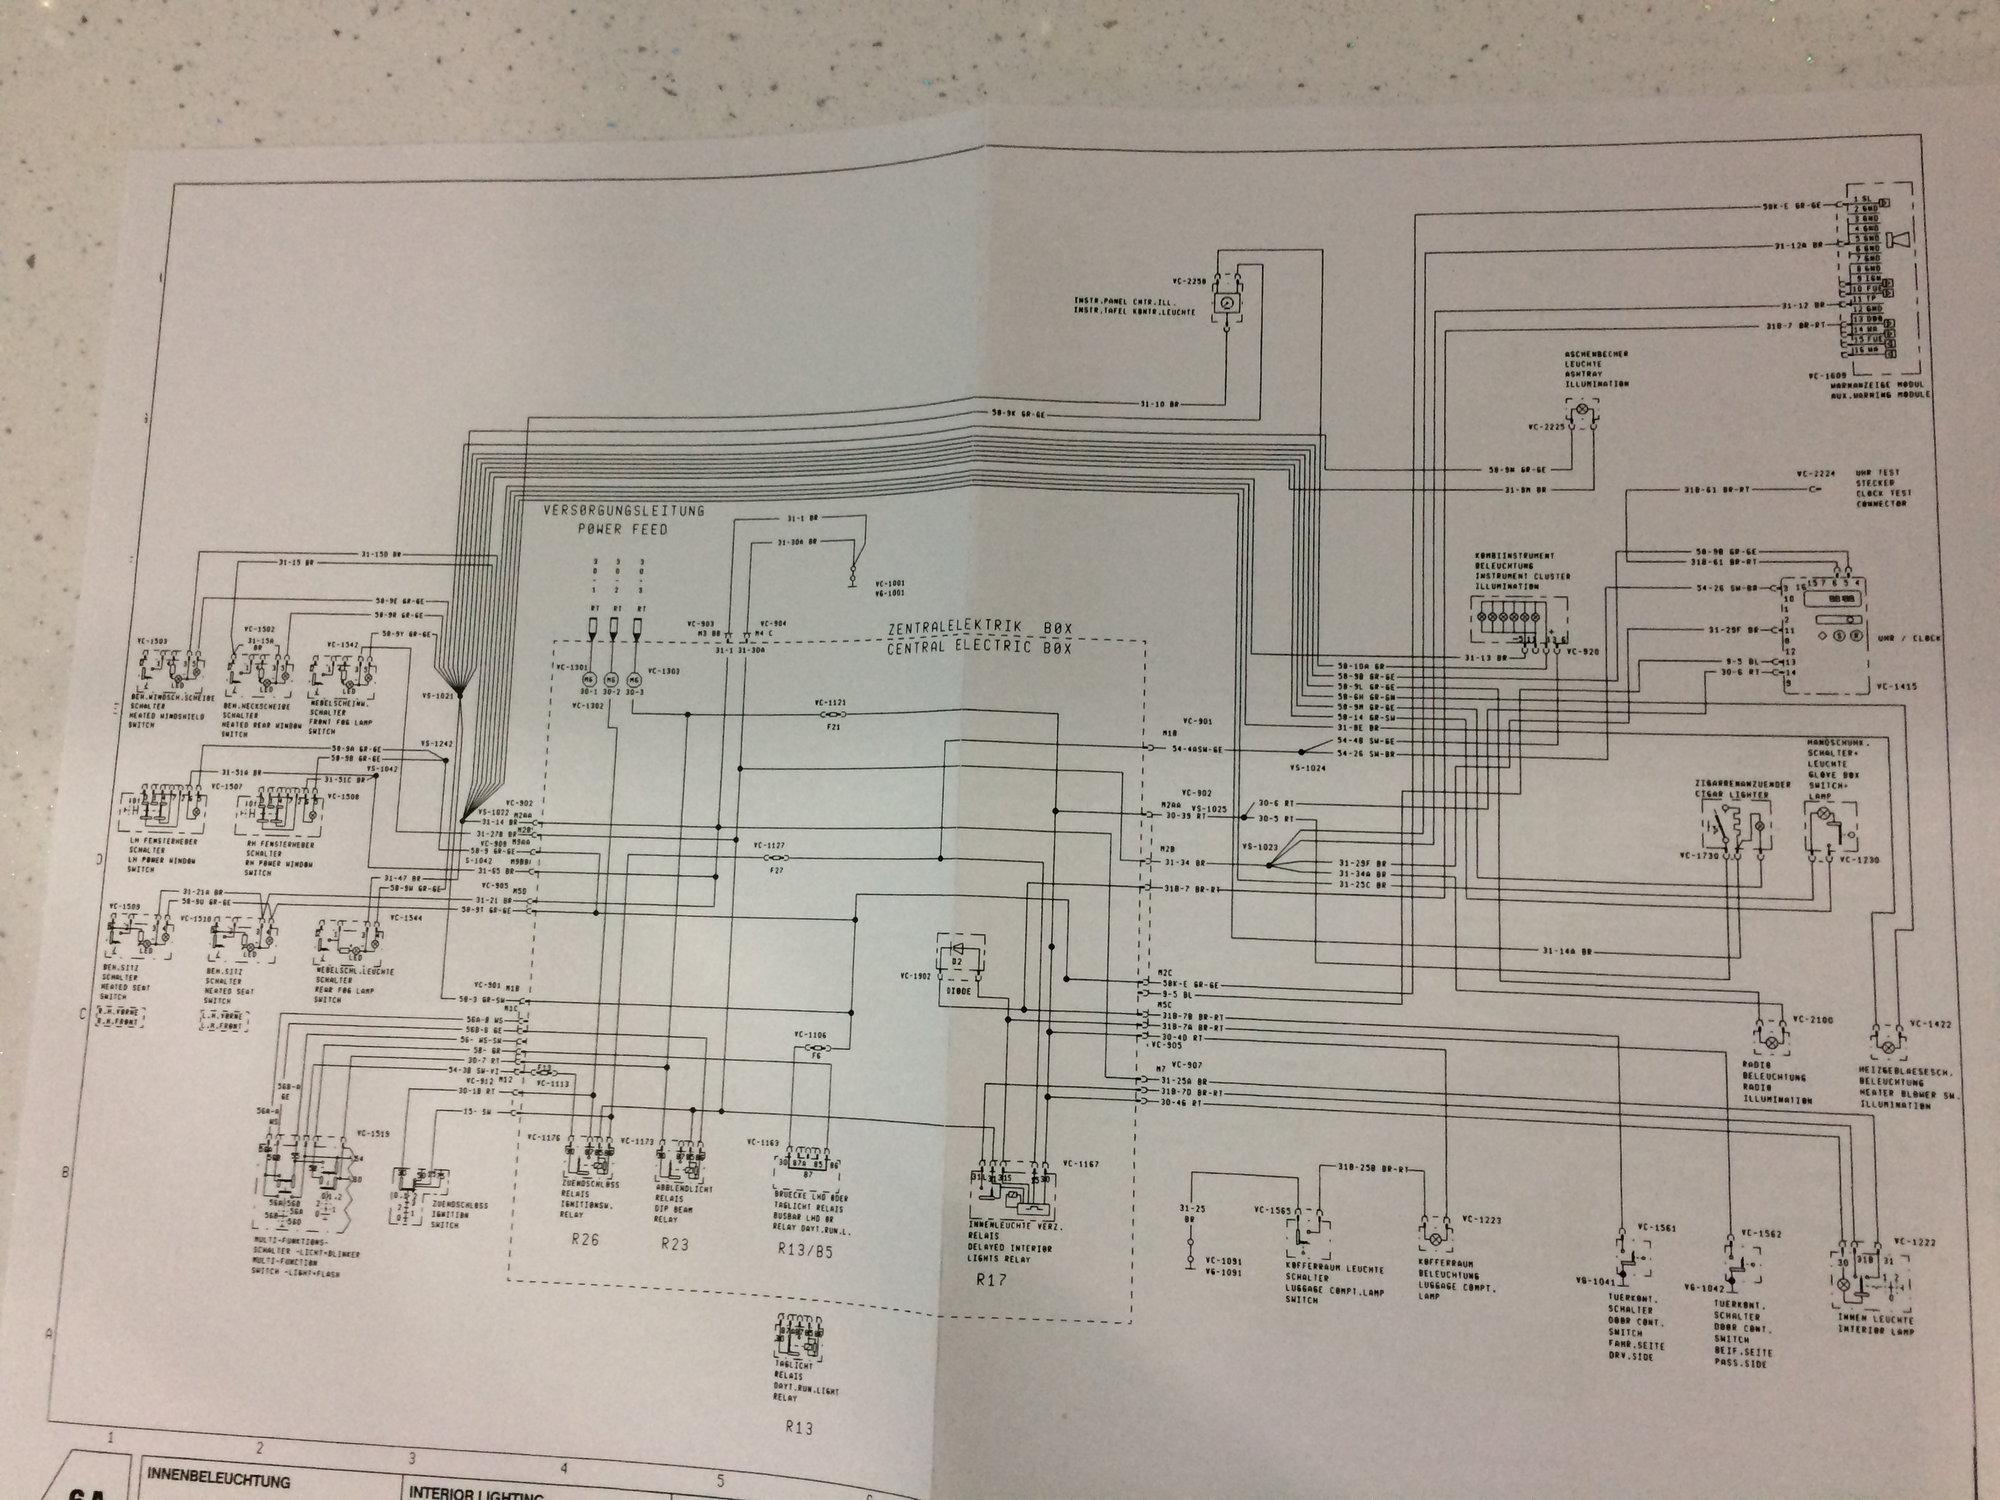 Diagram  Firex 4618 Wiring Diagram Full Version Hd Quality Wiring Diagram